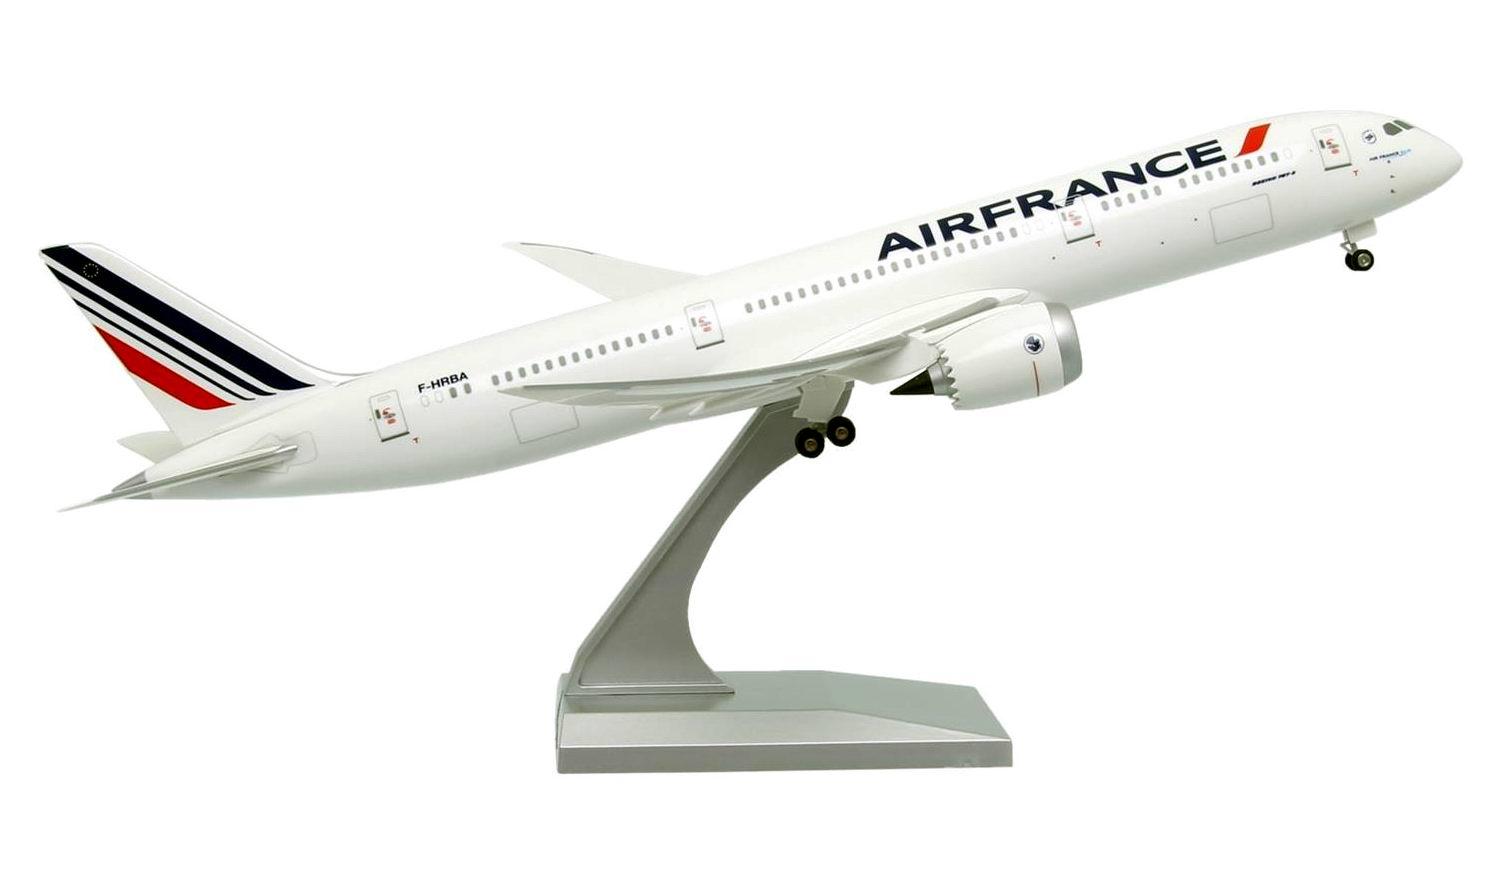 Maquette B787-9 Dreamliner AIR FRANCE 1/200